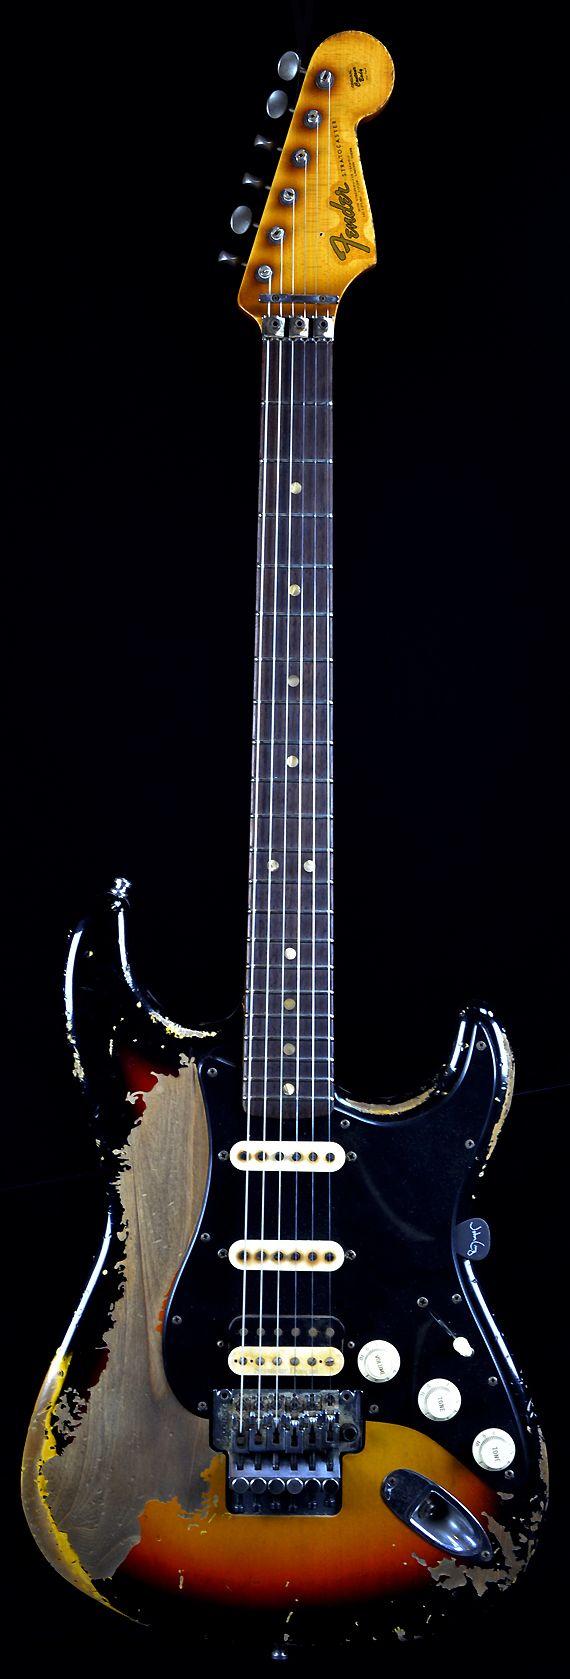 Strandberg plini boden os 6 guitars pinterest boden for Boden os 6 tremolo